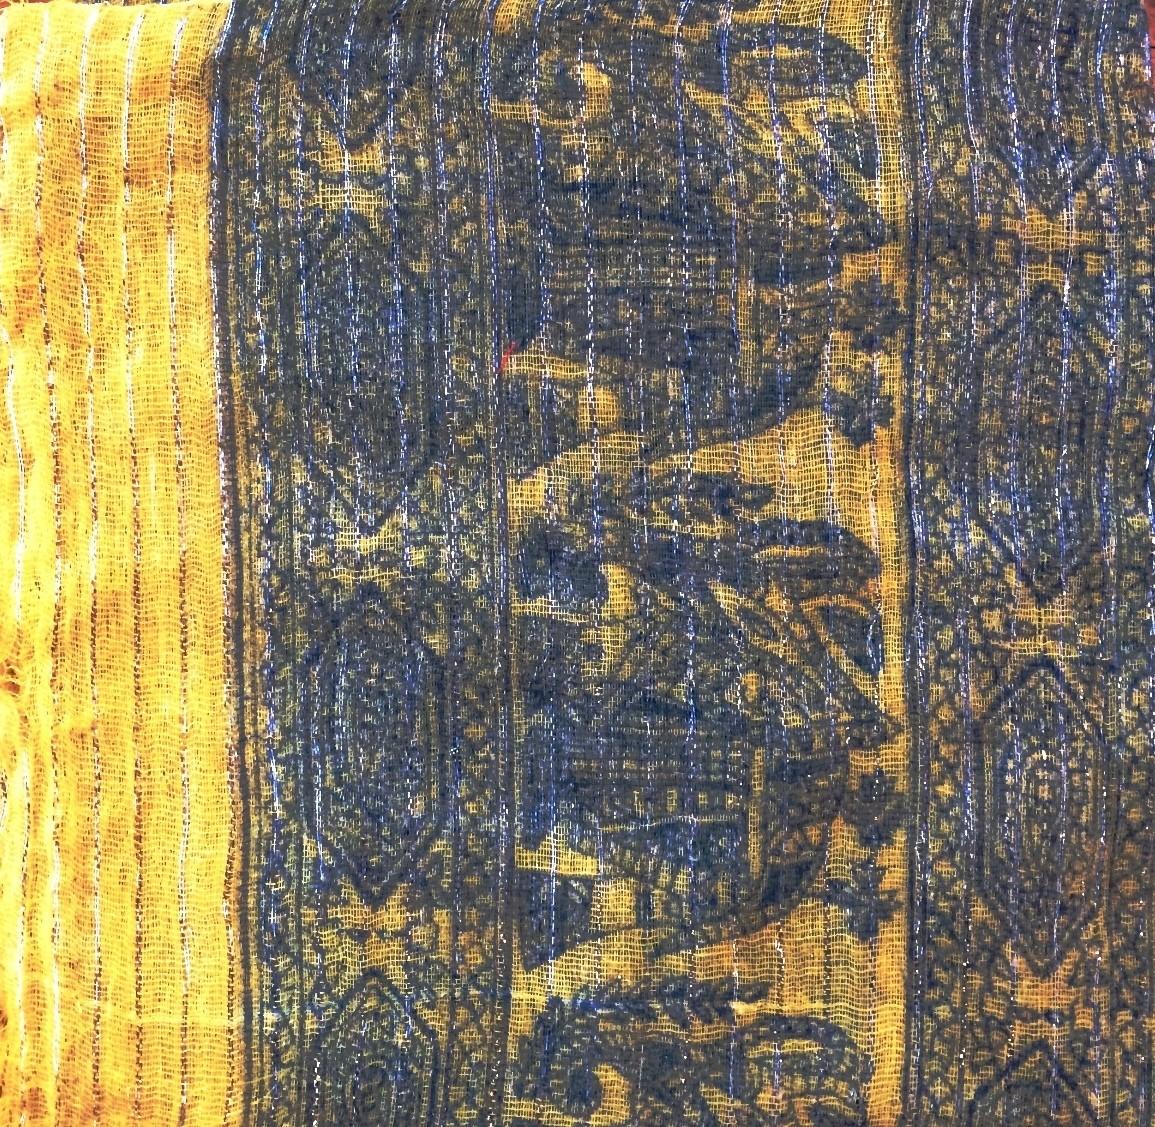 Yellow patterned lurex tichel